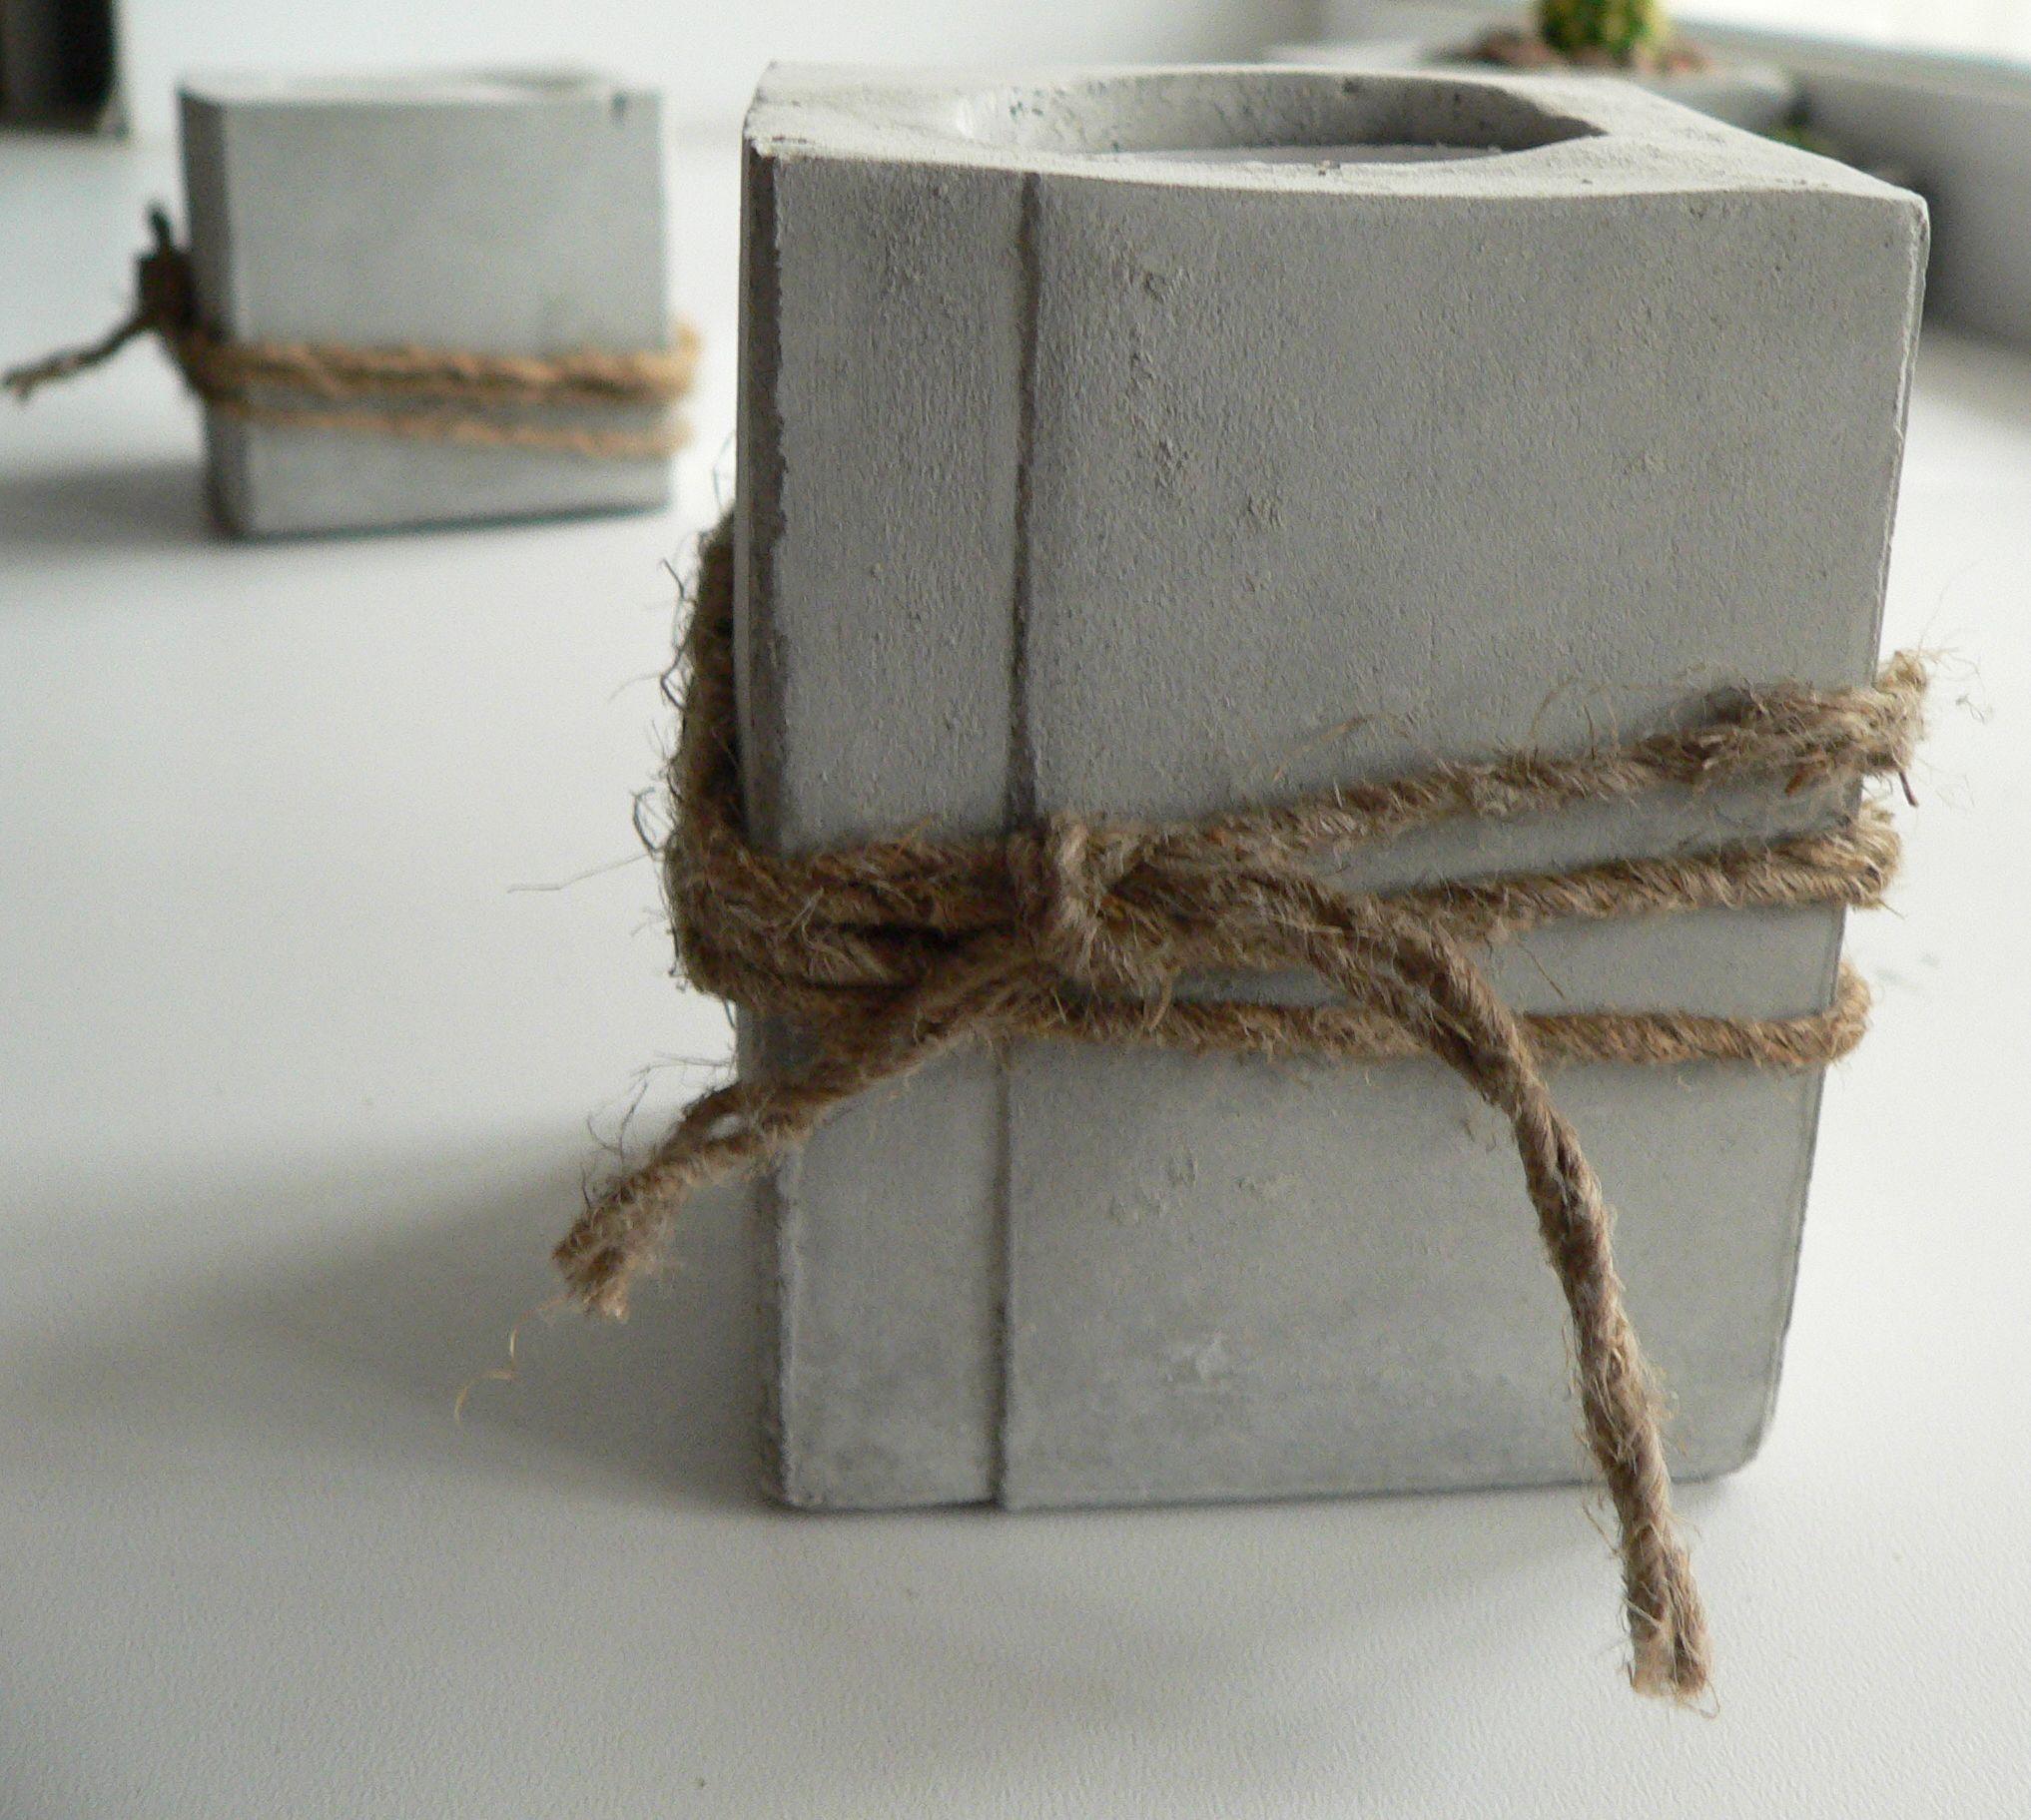 изделия подарки подсвечники бетон